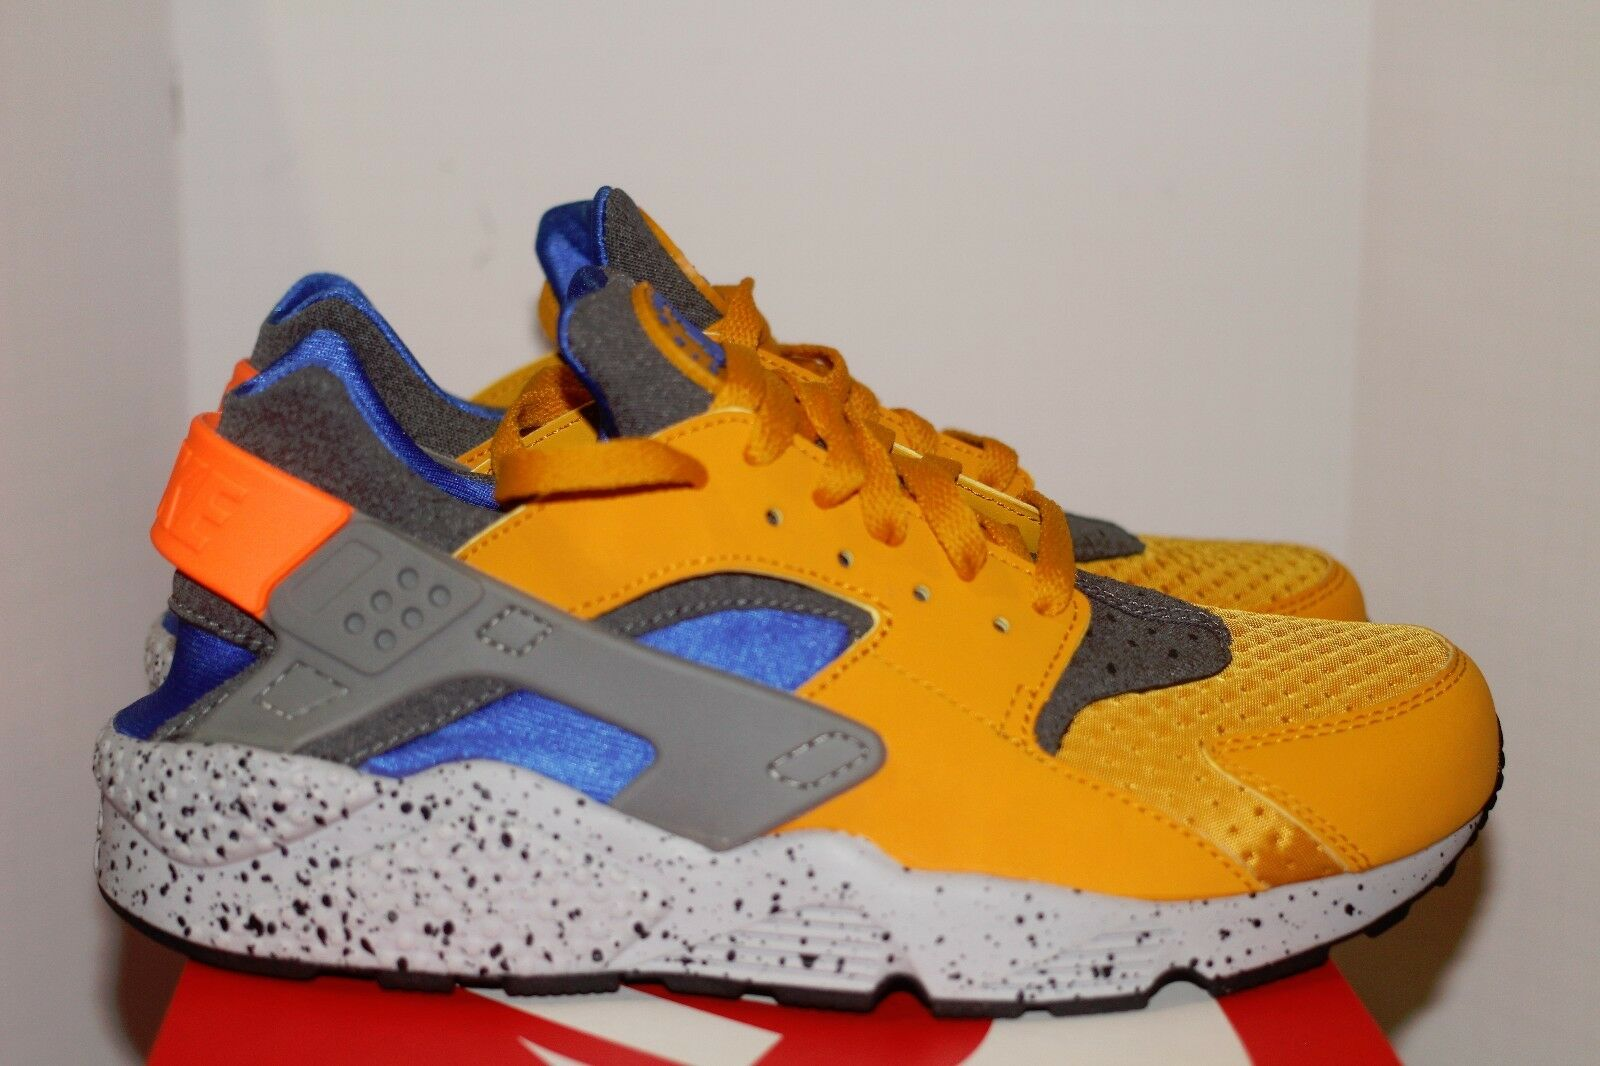 Nike Air Huarache Run SE Size 9.5 Gold Leaf Coblat Blue Orange Mowabb Pack